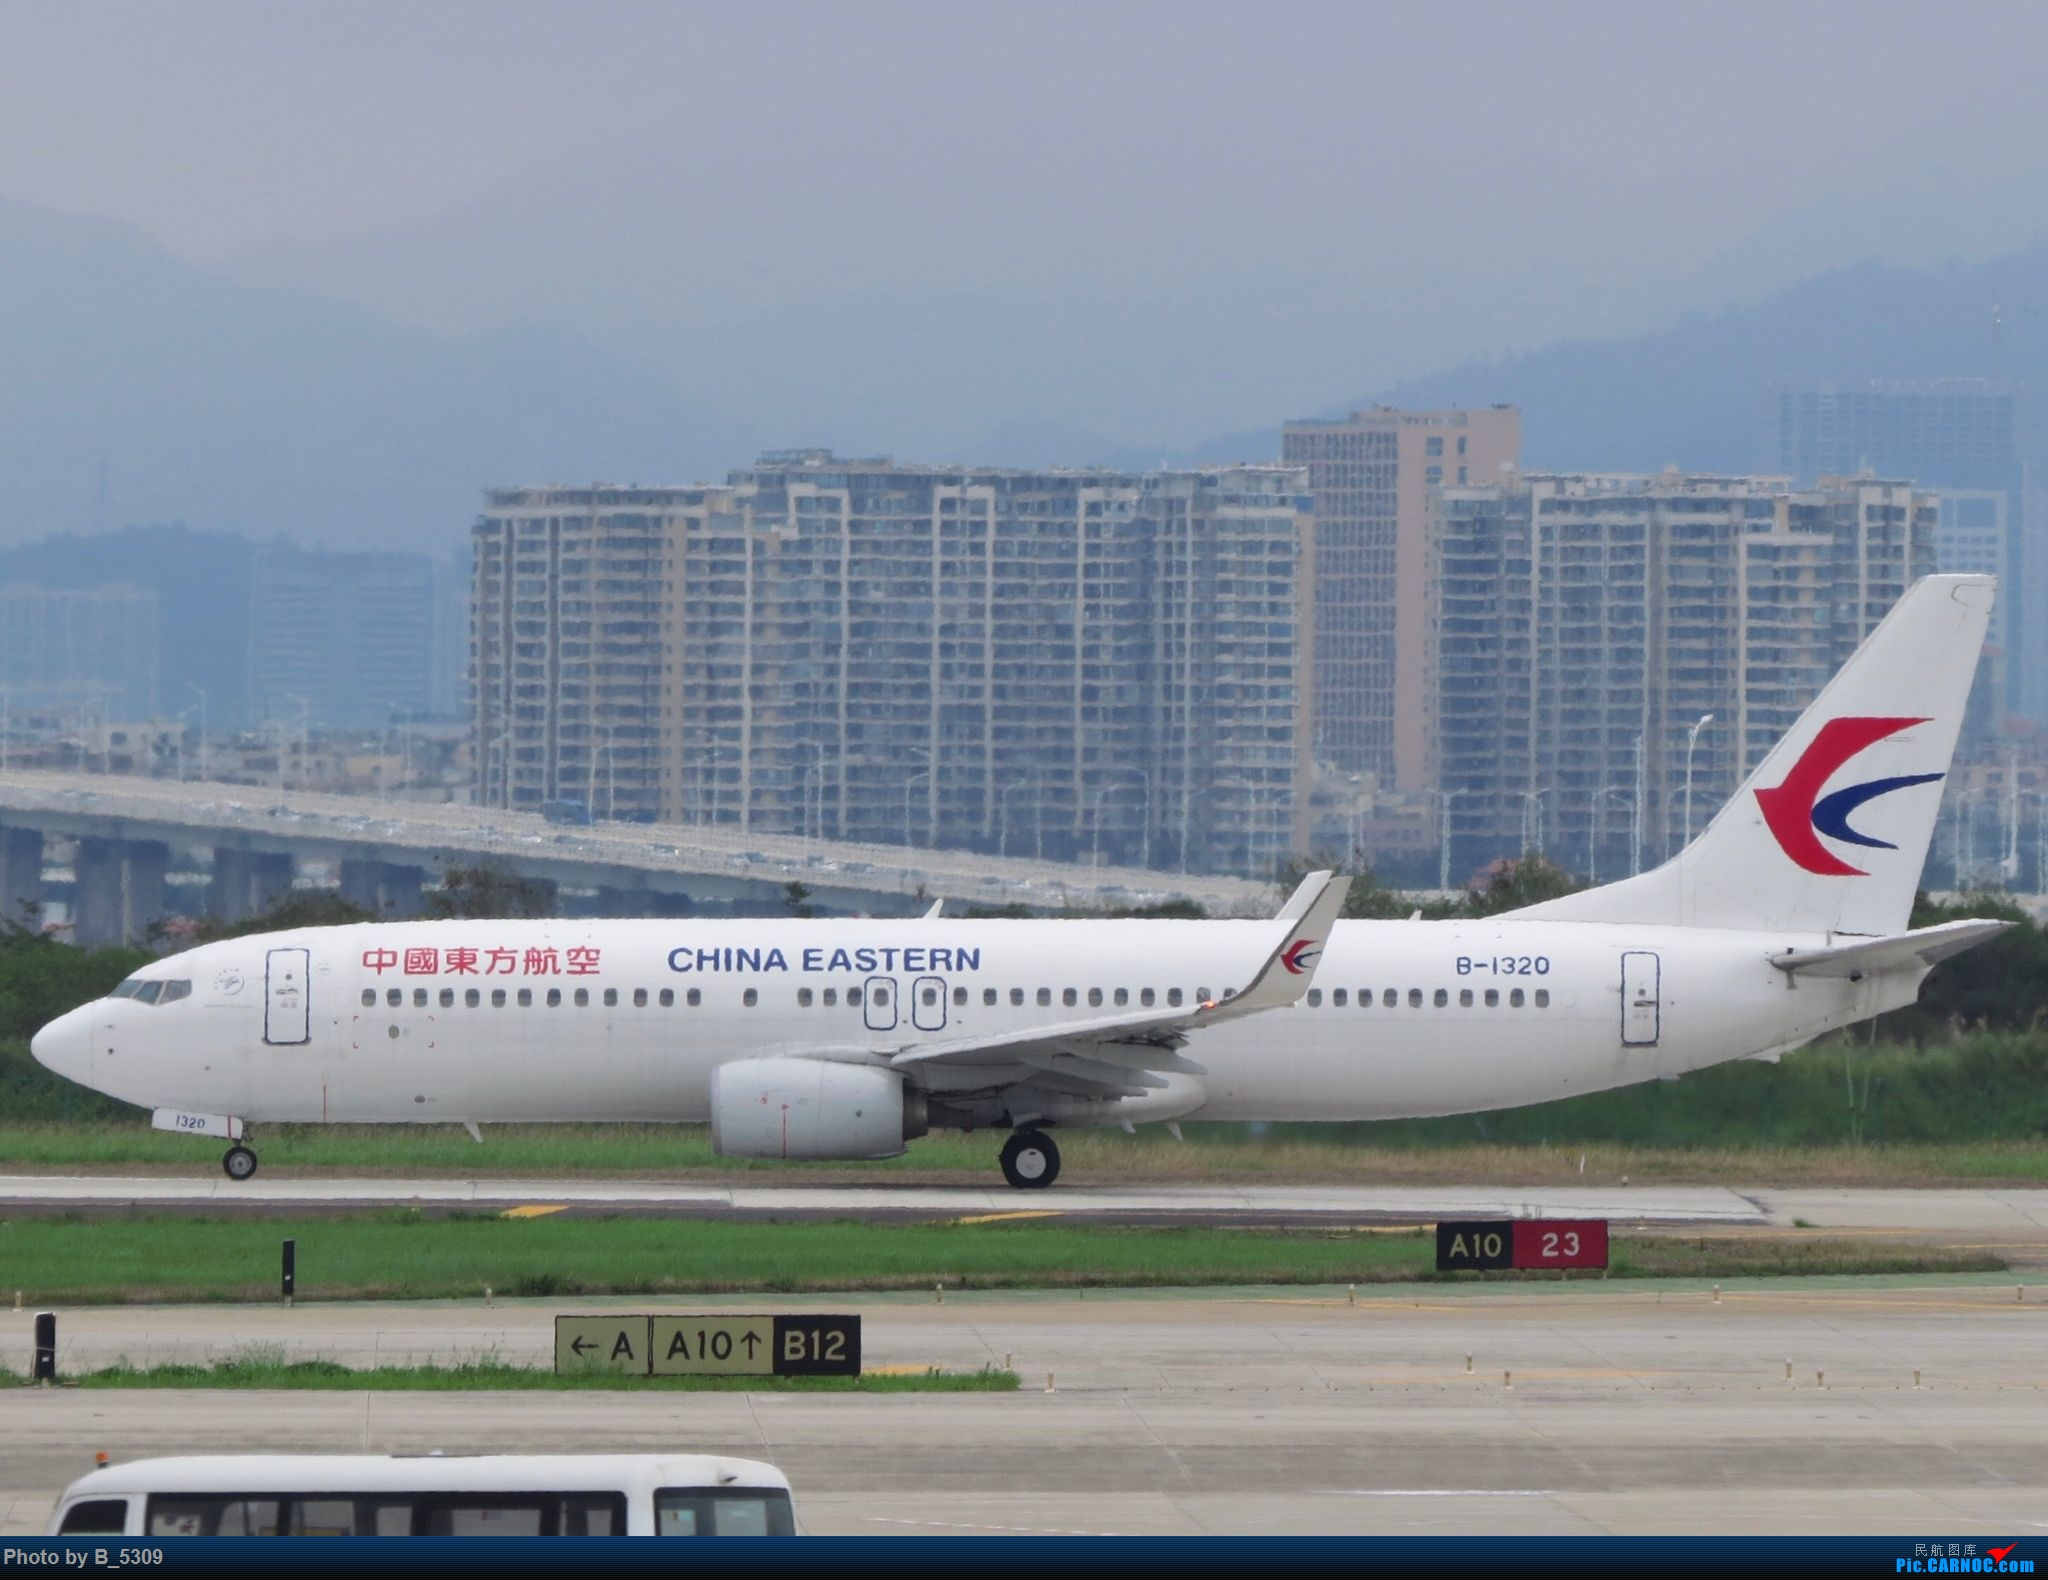 Re:[原创]复课一个月了,终于能在紧张的学习生活中抽出点时间拍稽~ BOEING 737-800 B-1320 中国厦门高崎国际机场